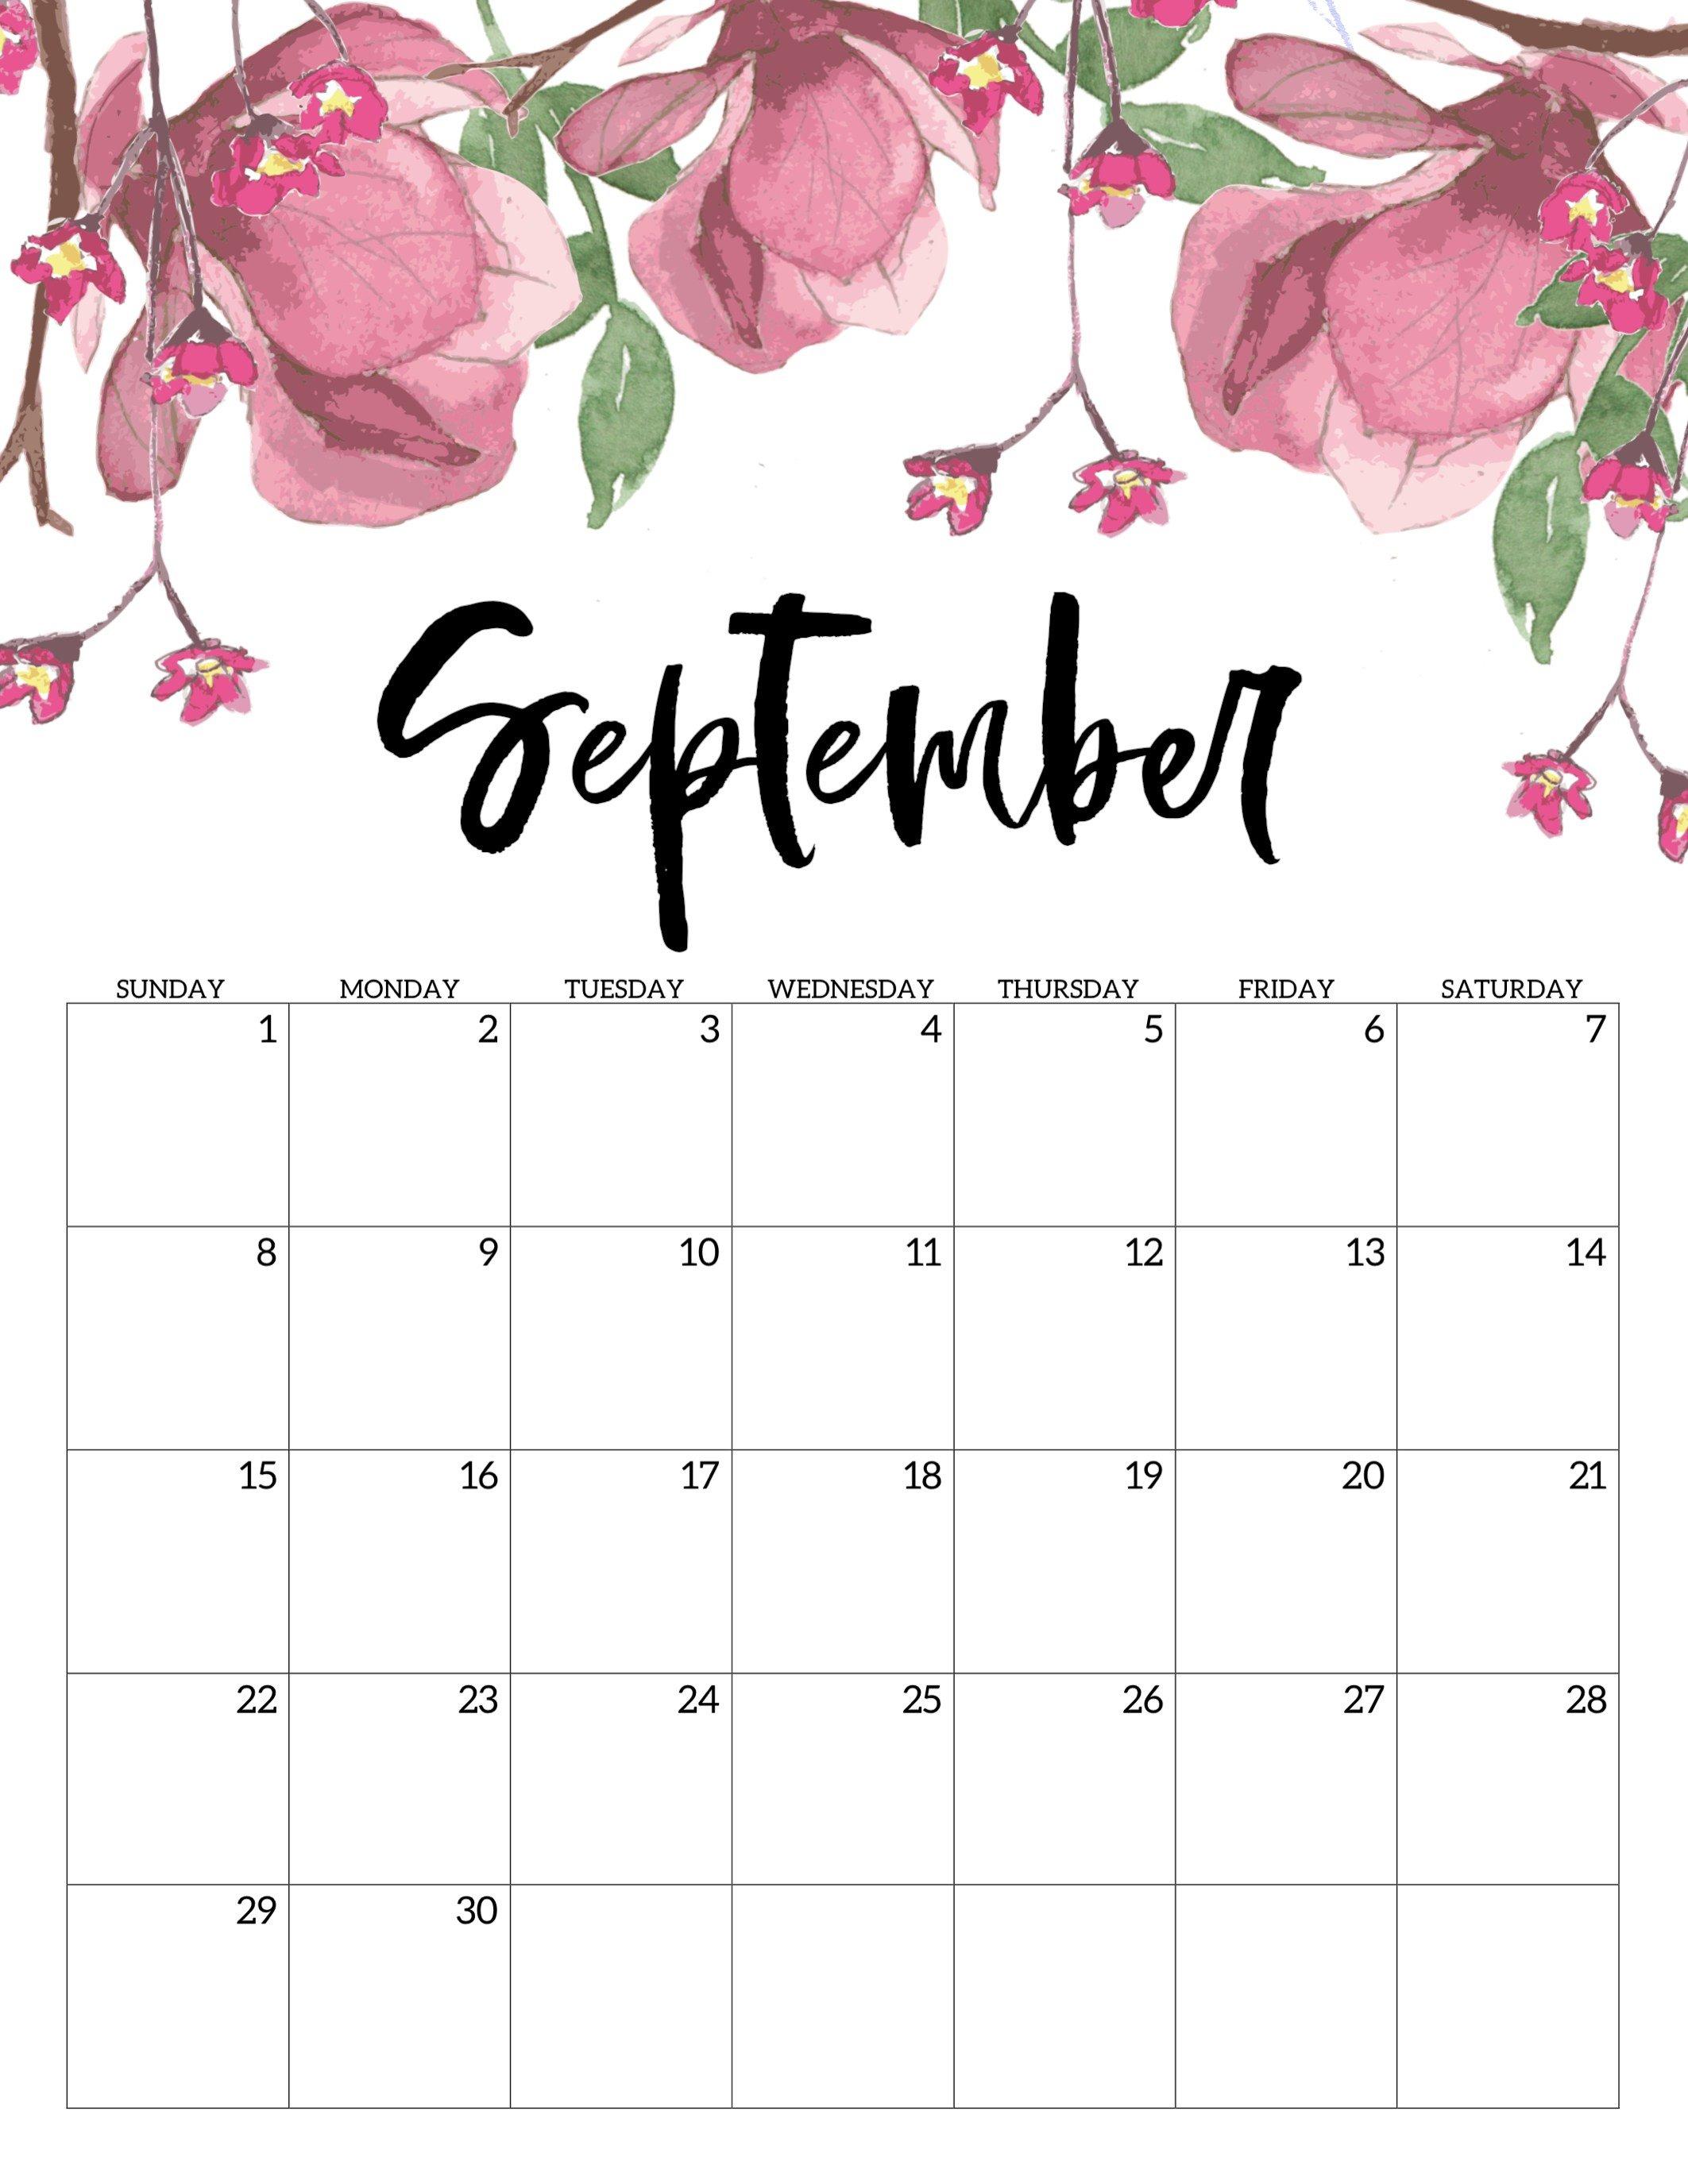 Free Printable Calendar 2019 – Floral – Paper Trail Design Calendar 2019 Girly